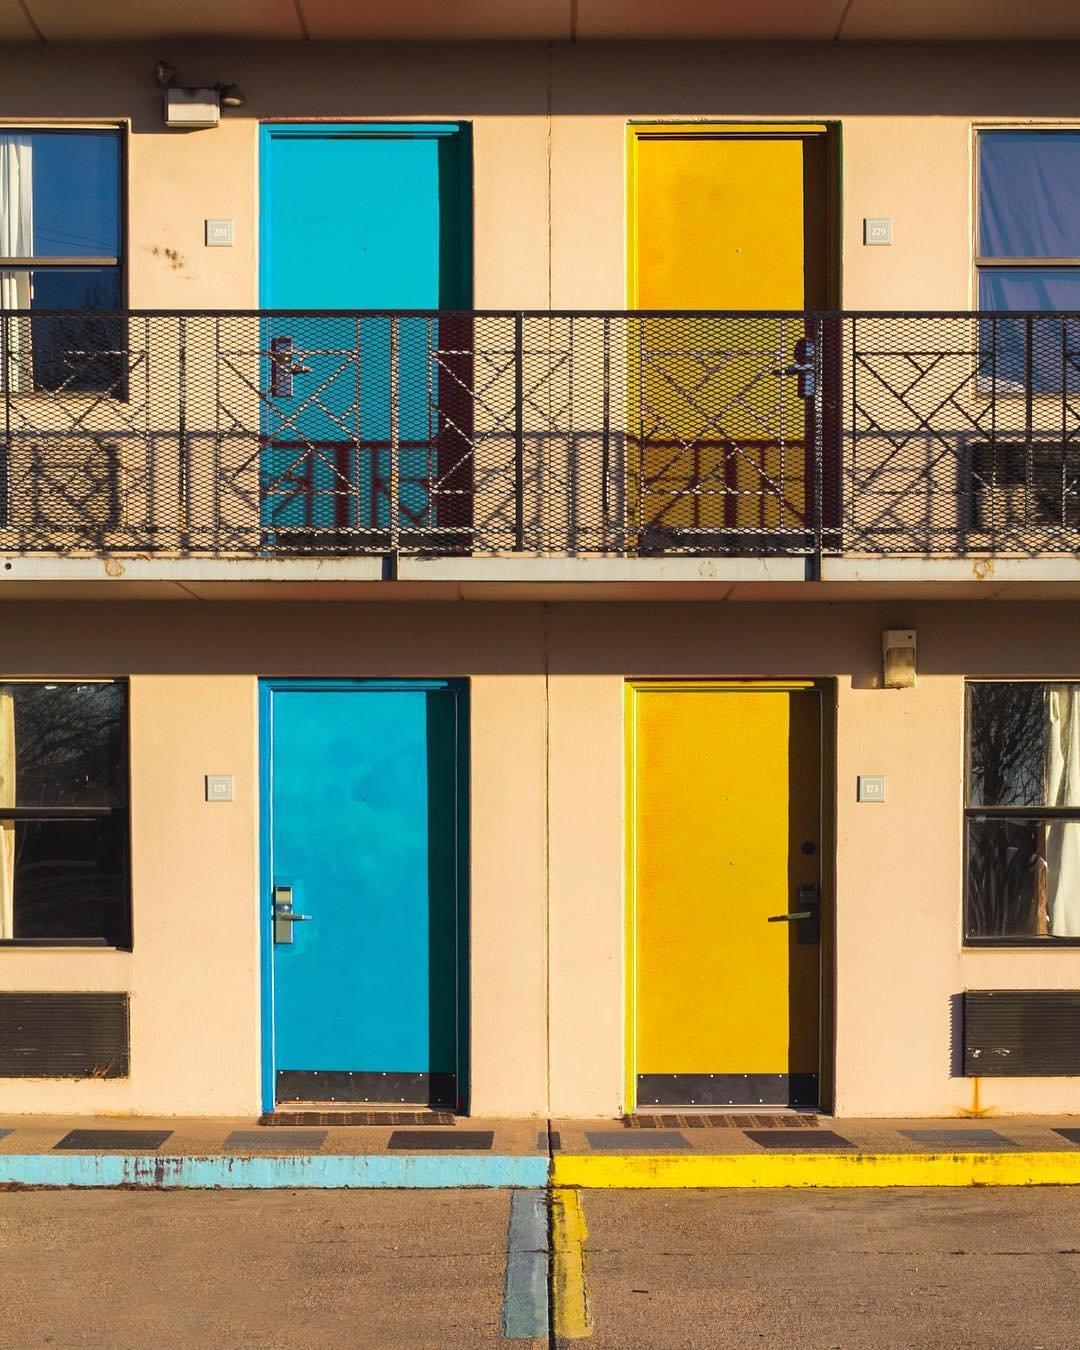 Архитектурный минимализм от Джейкоба Митчелла